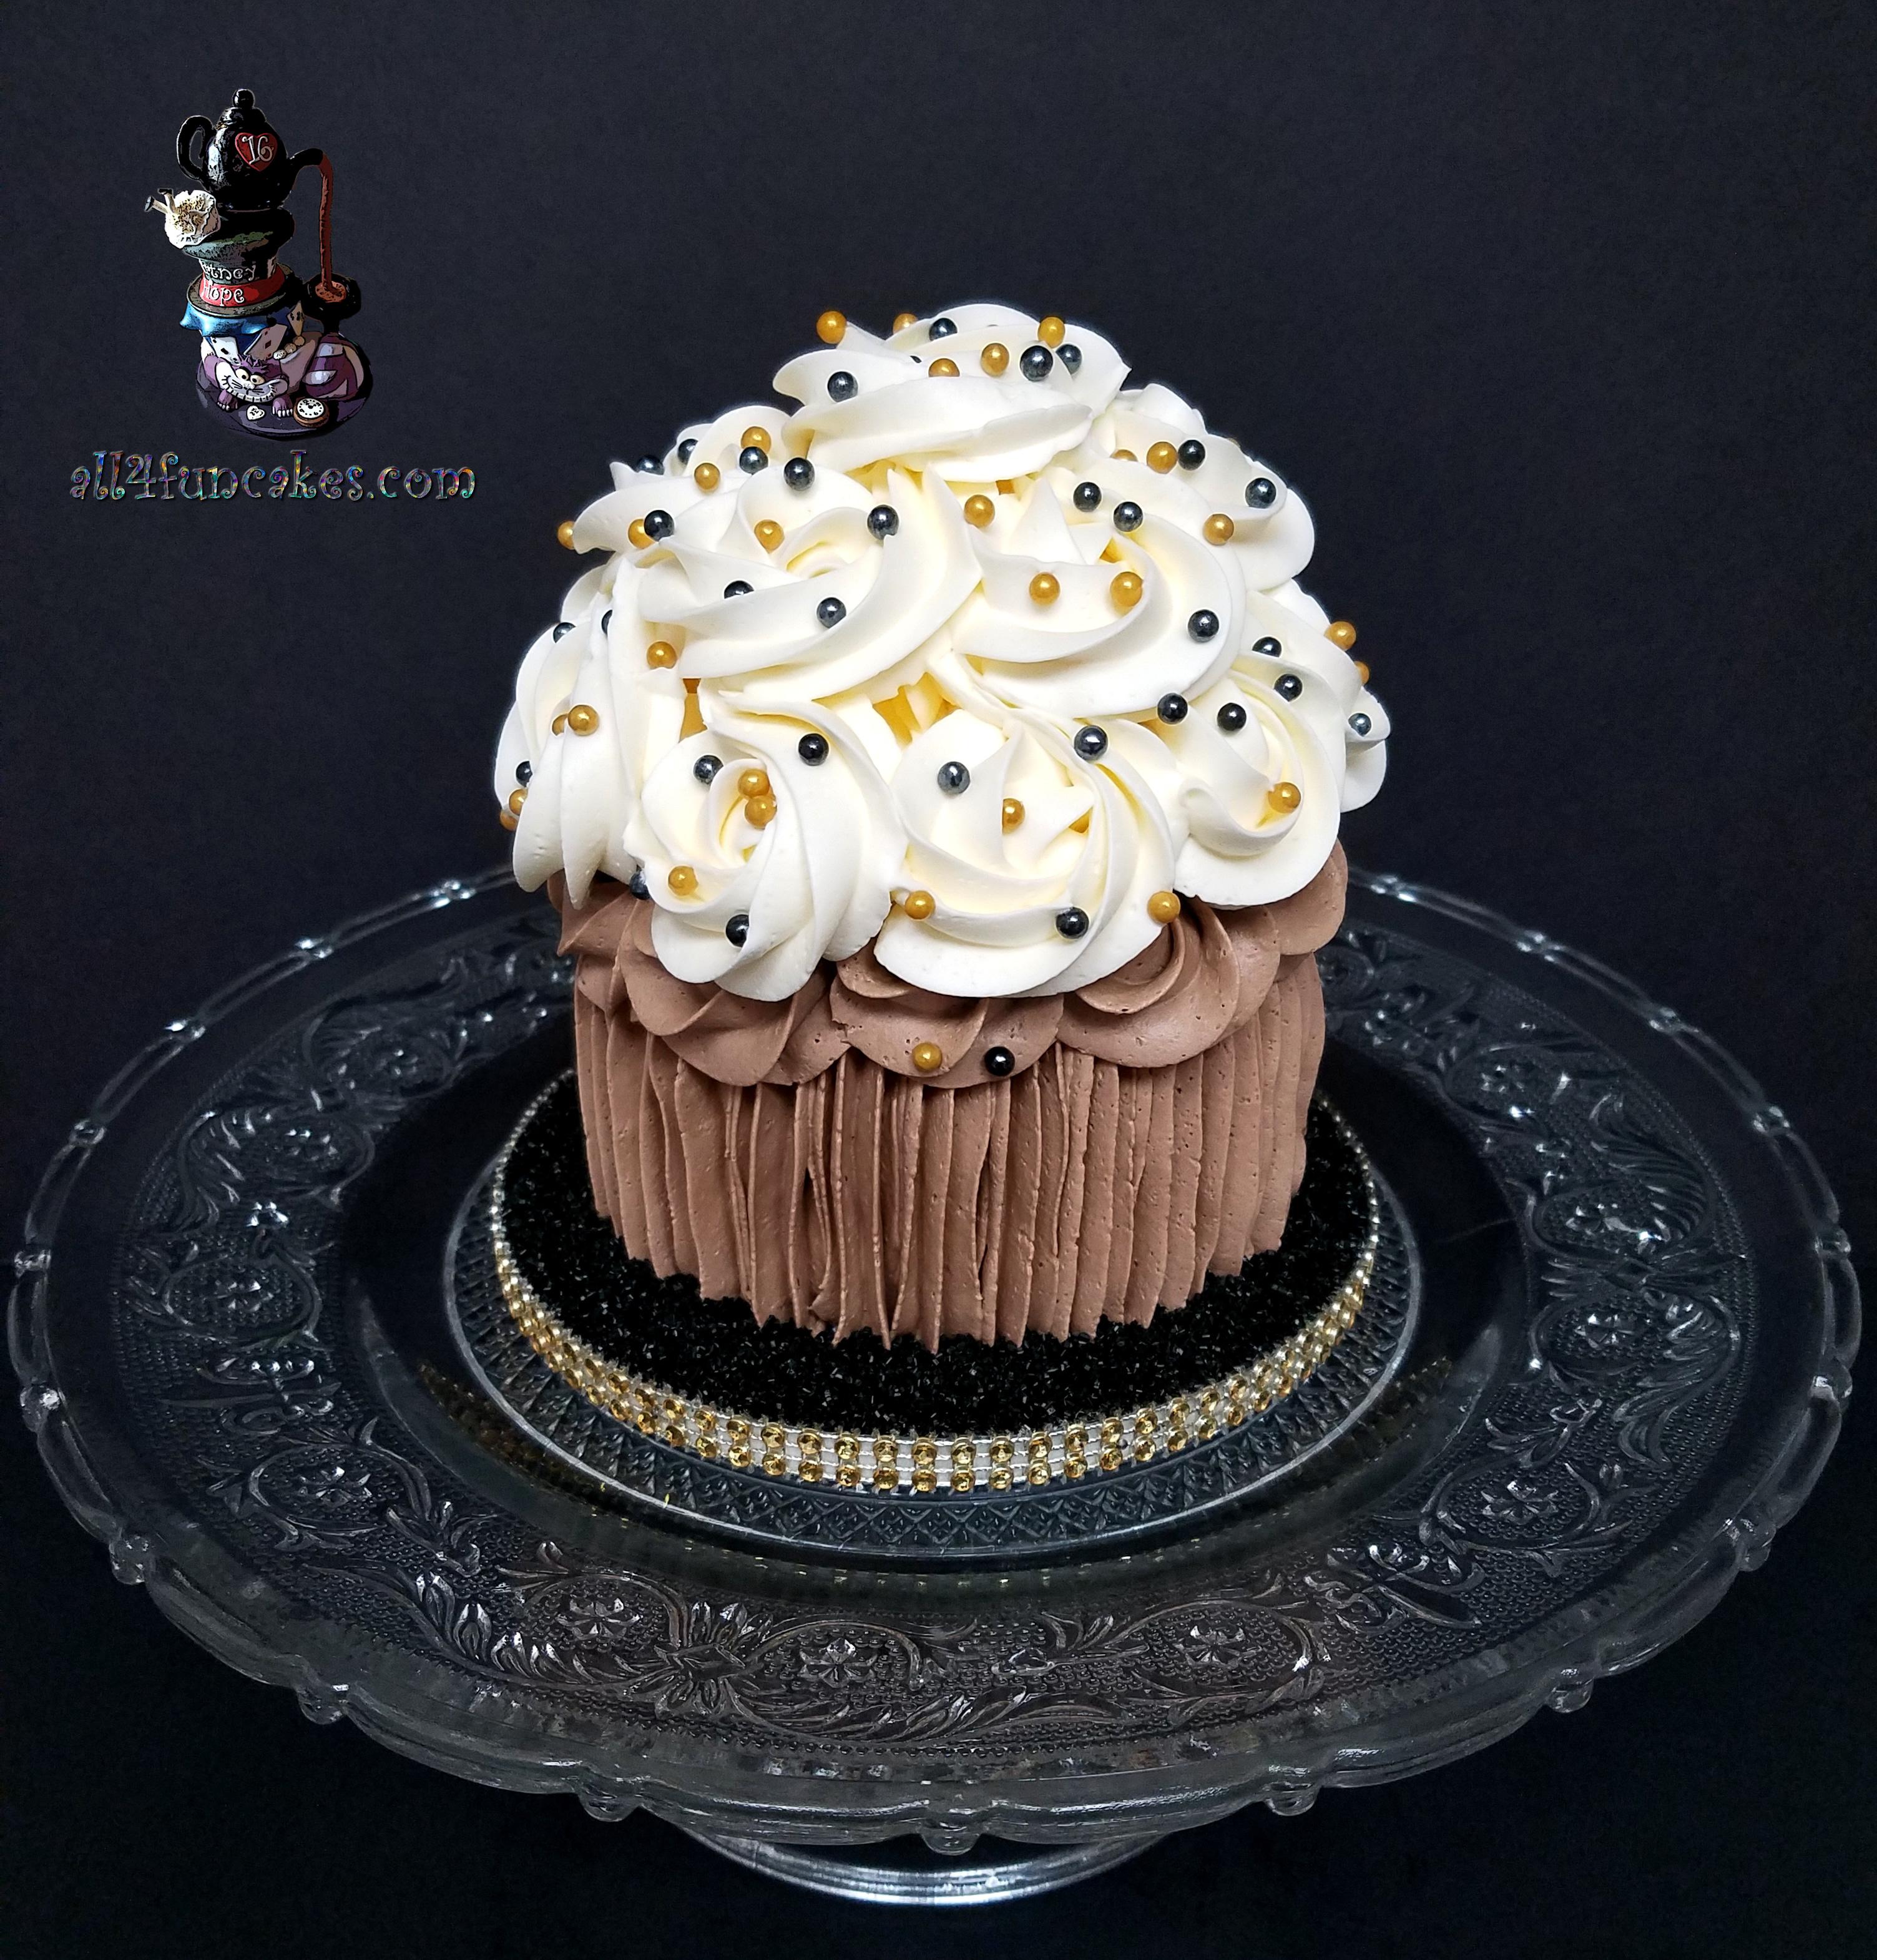 Mini 60th Birthday Smash Cake by All4Fun Cakes LLC 2018